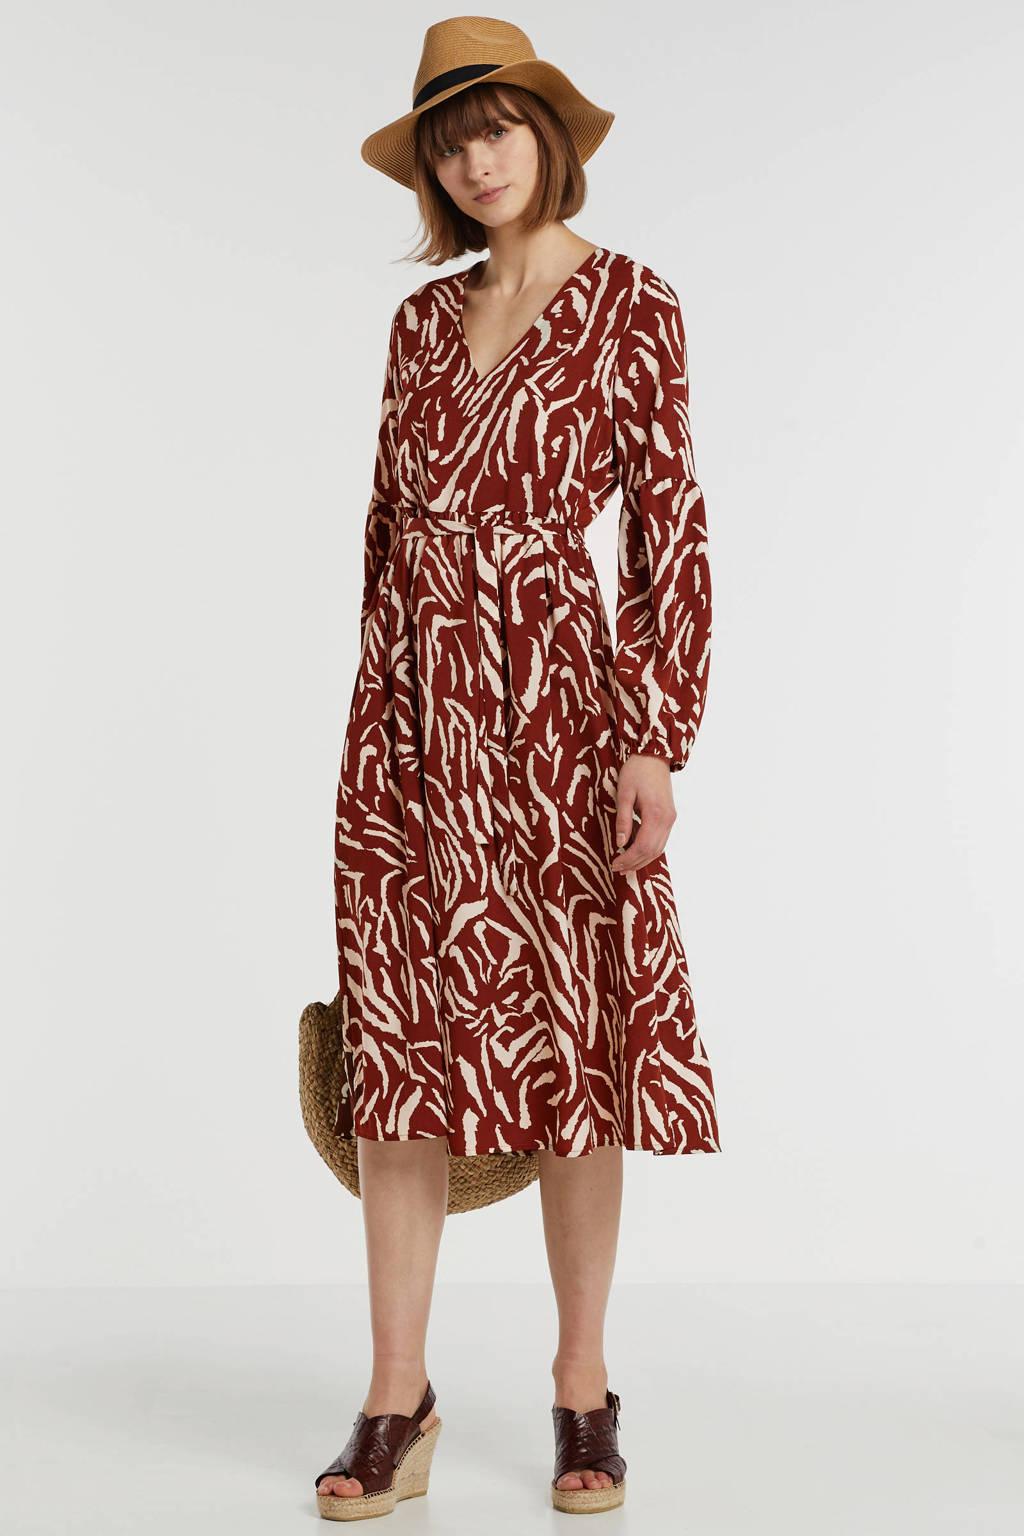 VILA geweven jurk met all over print en ceintuur ecru/rood, Ecru/rood